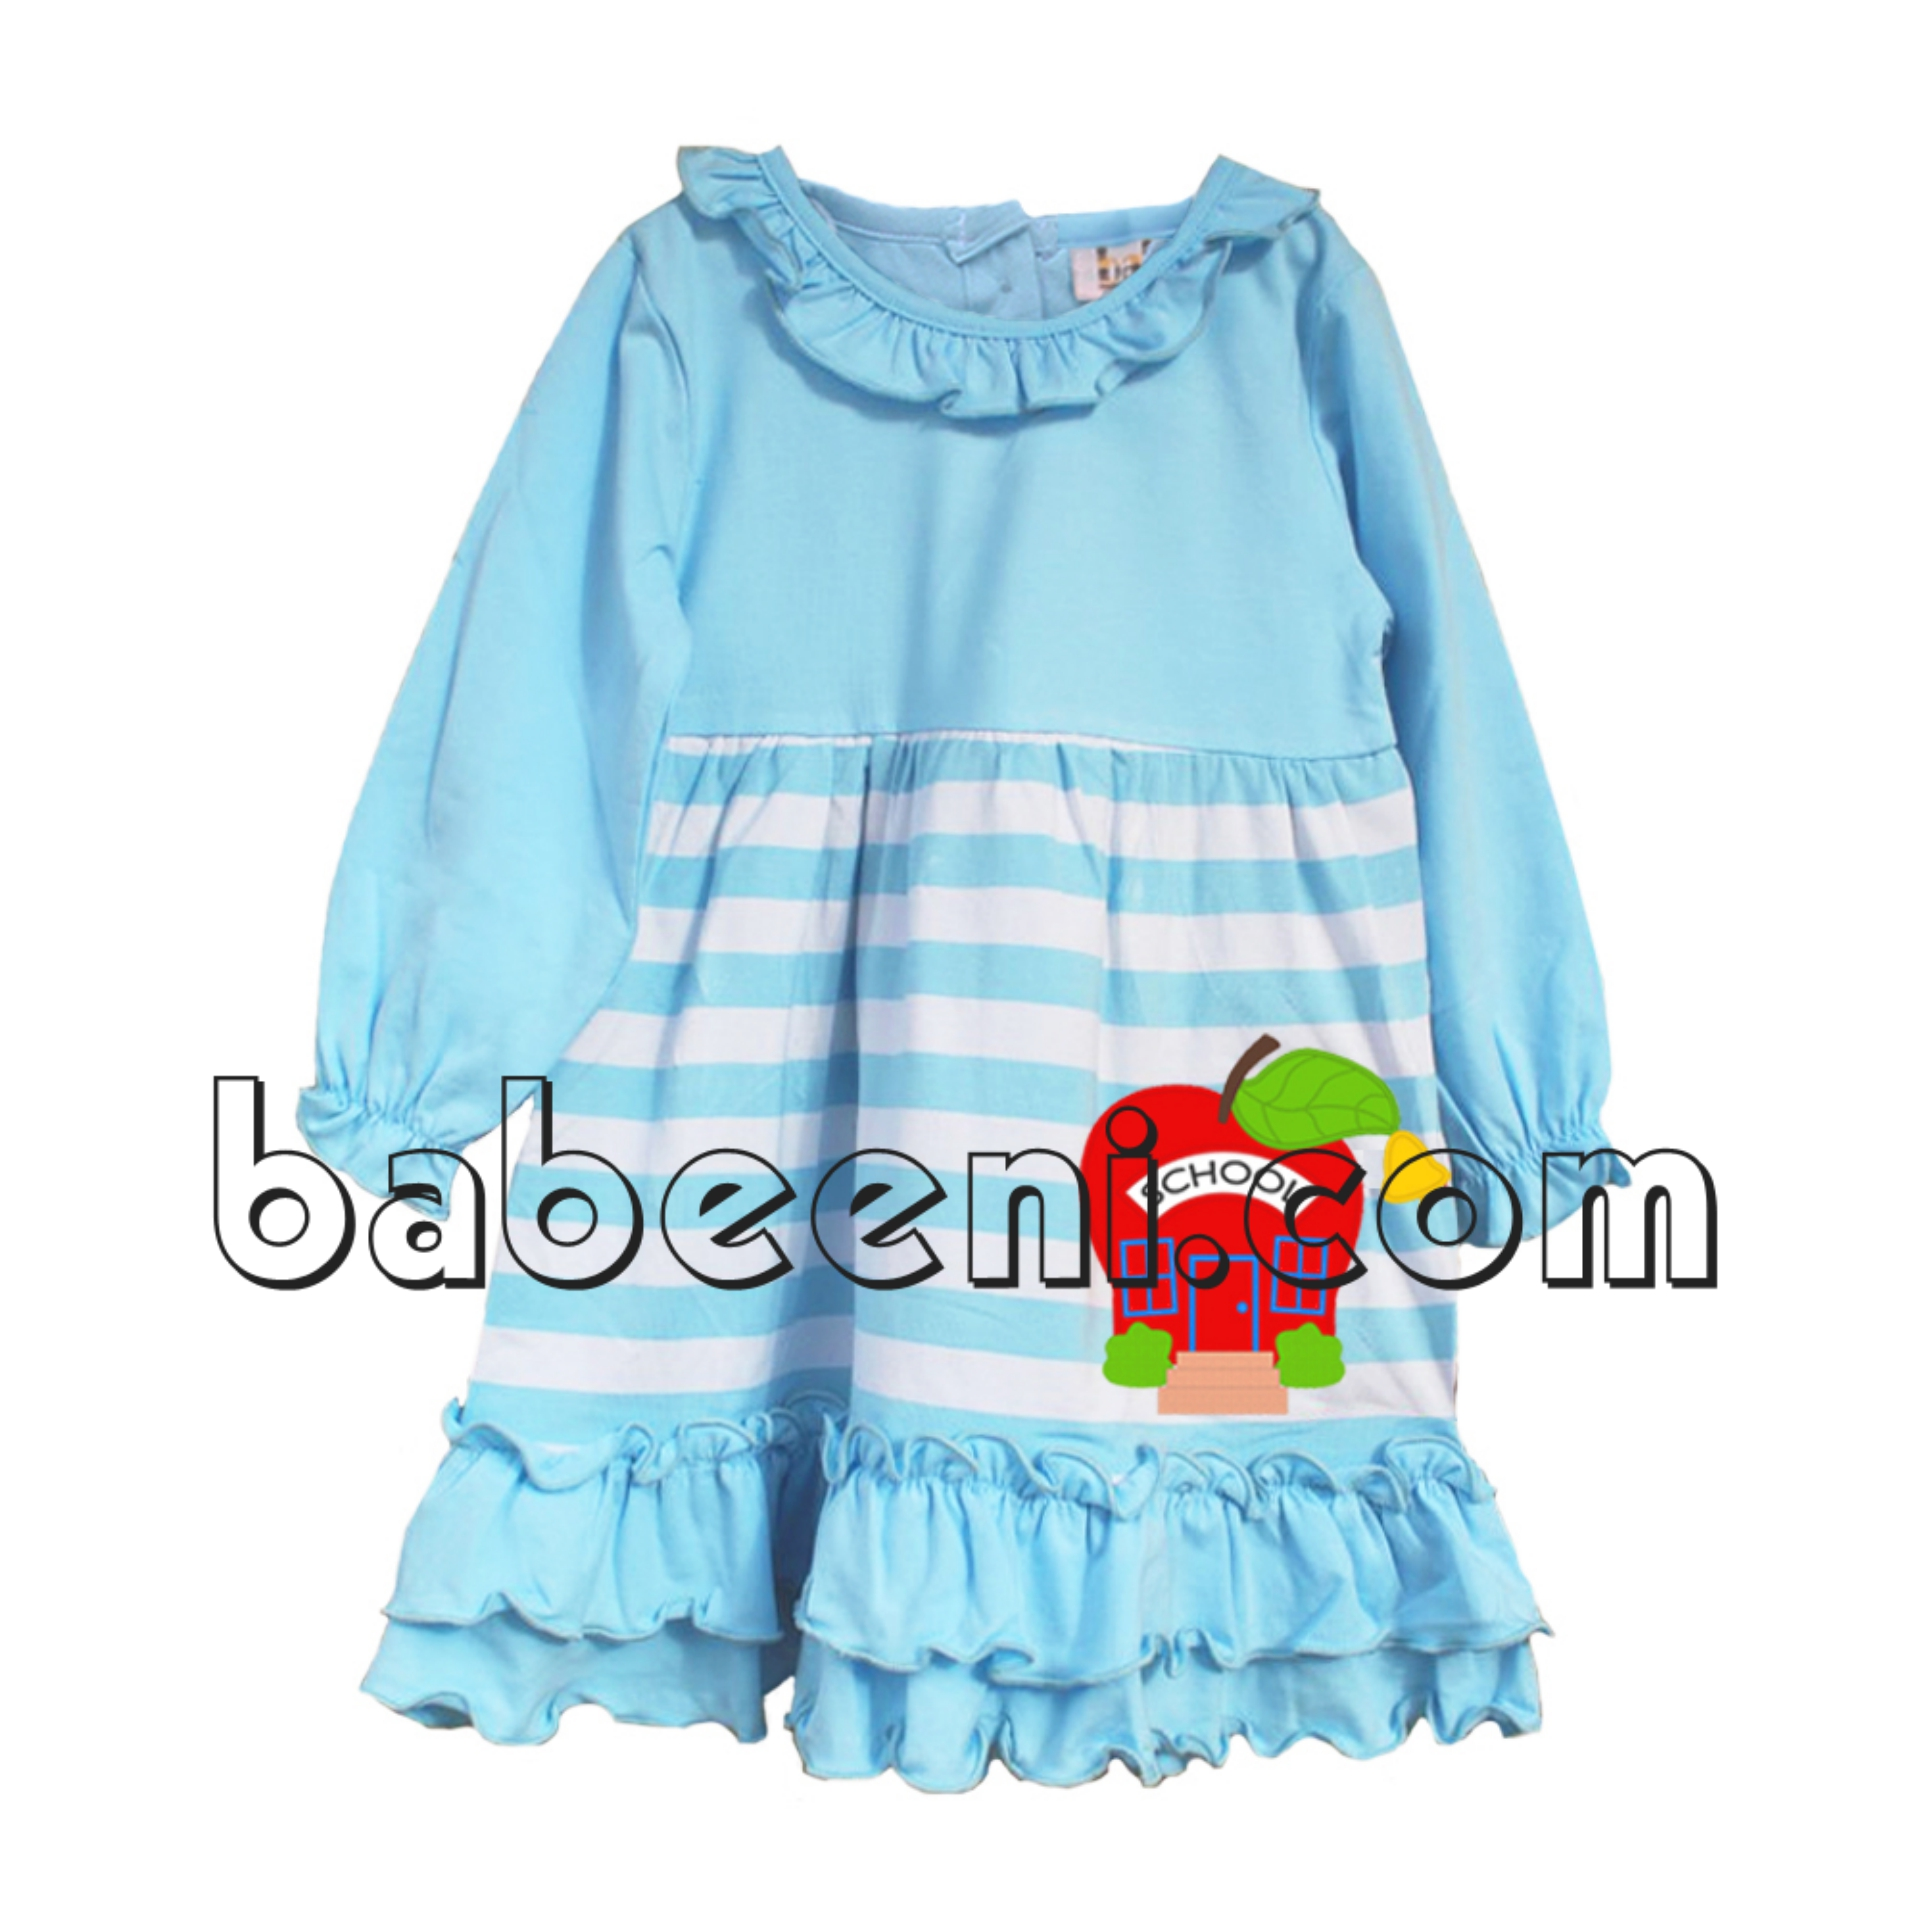 Lovely apple applique knit dress - KN 197